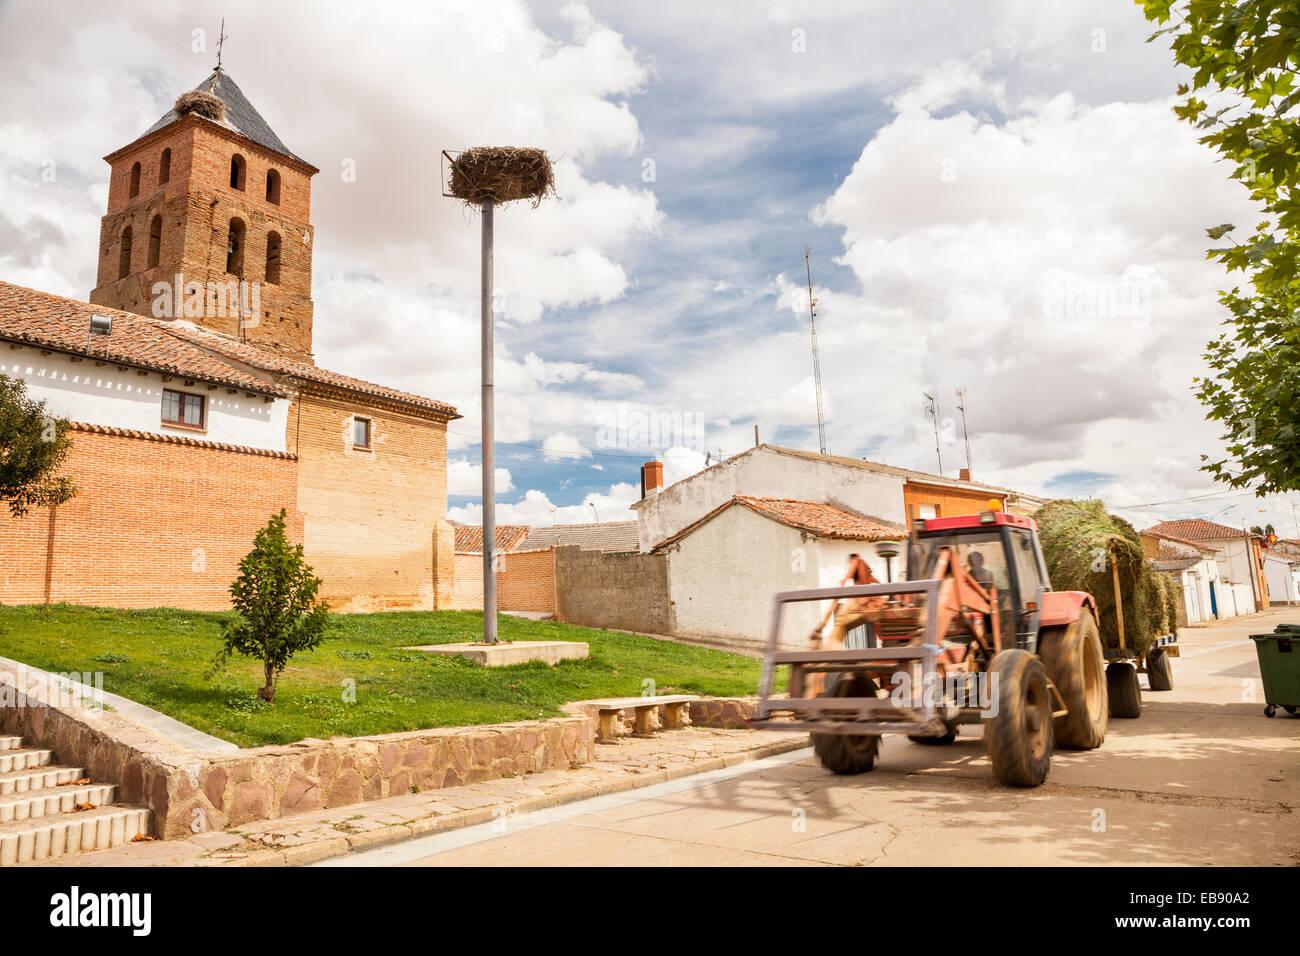 San Esteban Church in Calzada del Coto, Way of St. James, Leon, Spain - Stock Image